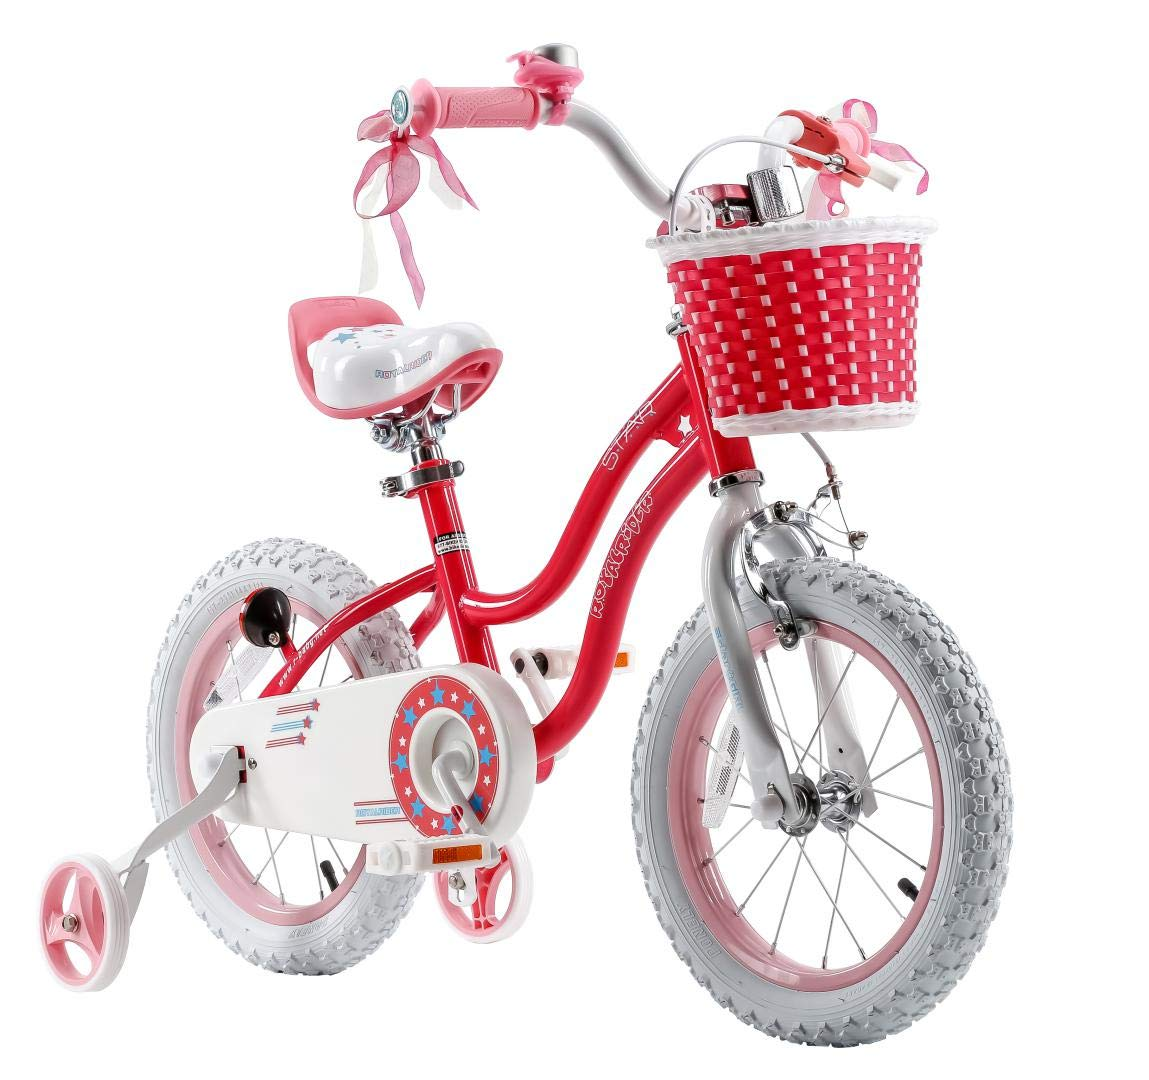 Kids Bicycle Accessories Kids Bicycle Basket with Flower DRBIKE Kids Bike Basket for 12 14 16 18 inch Girls Bike